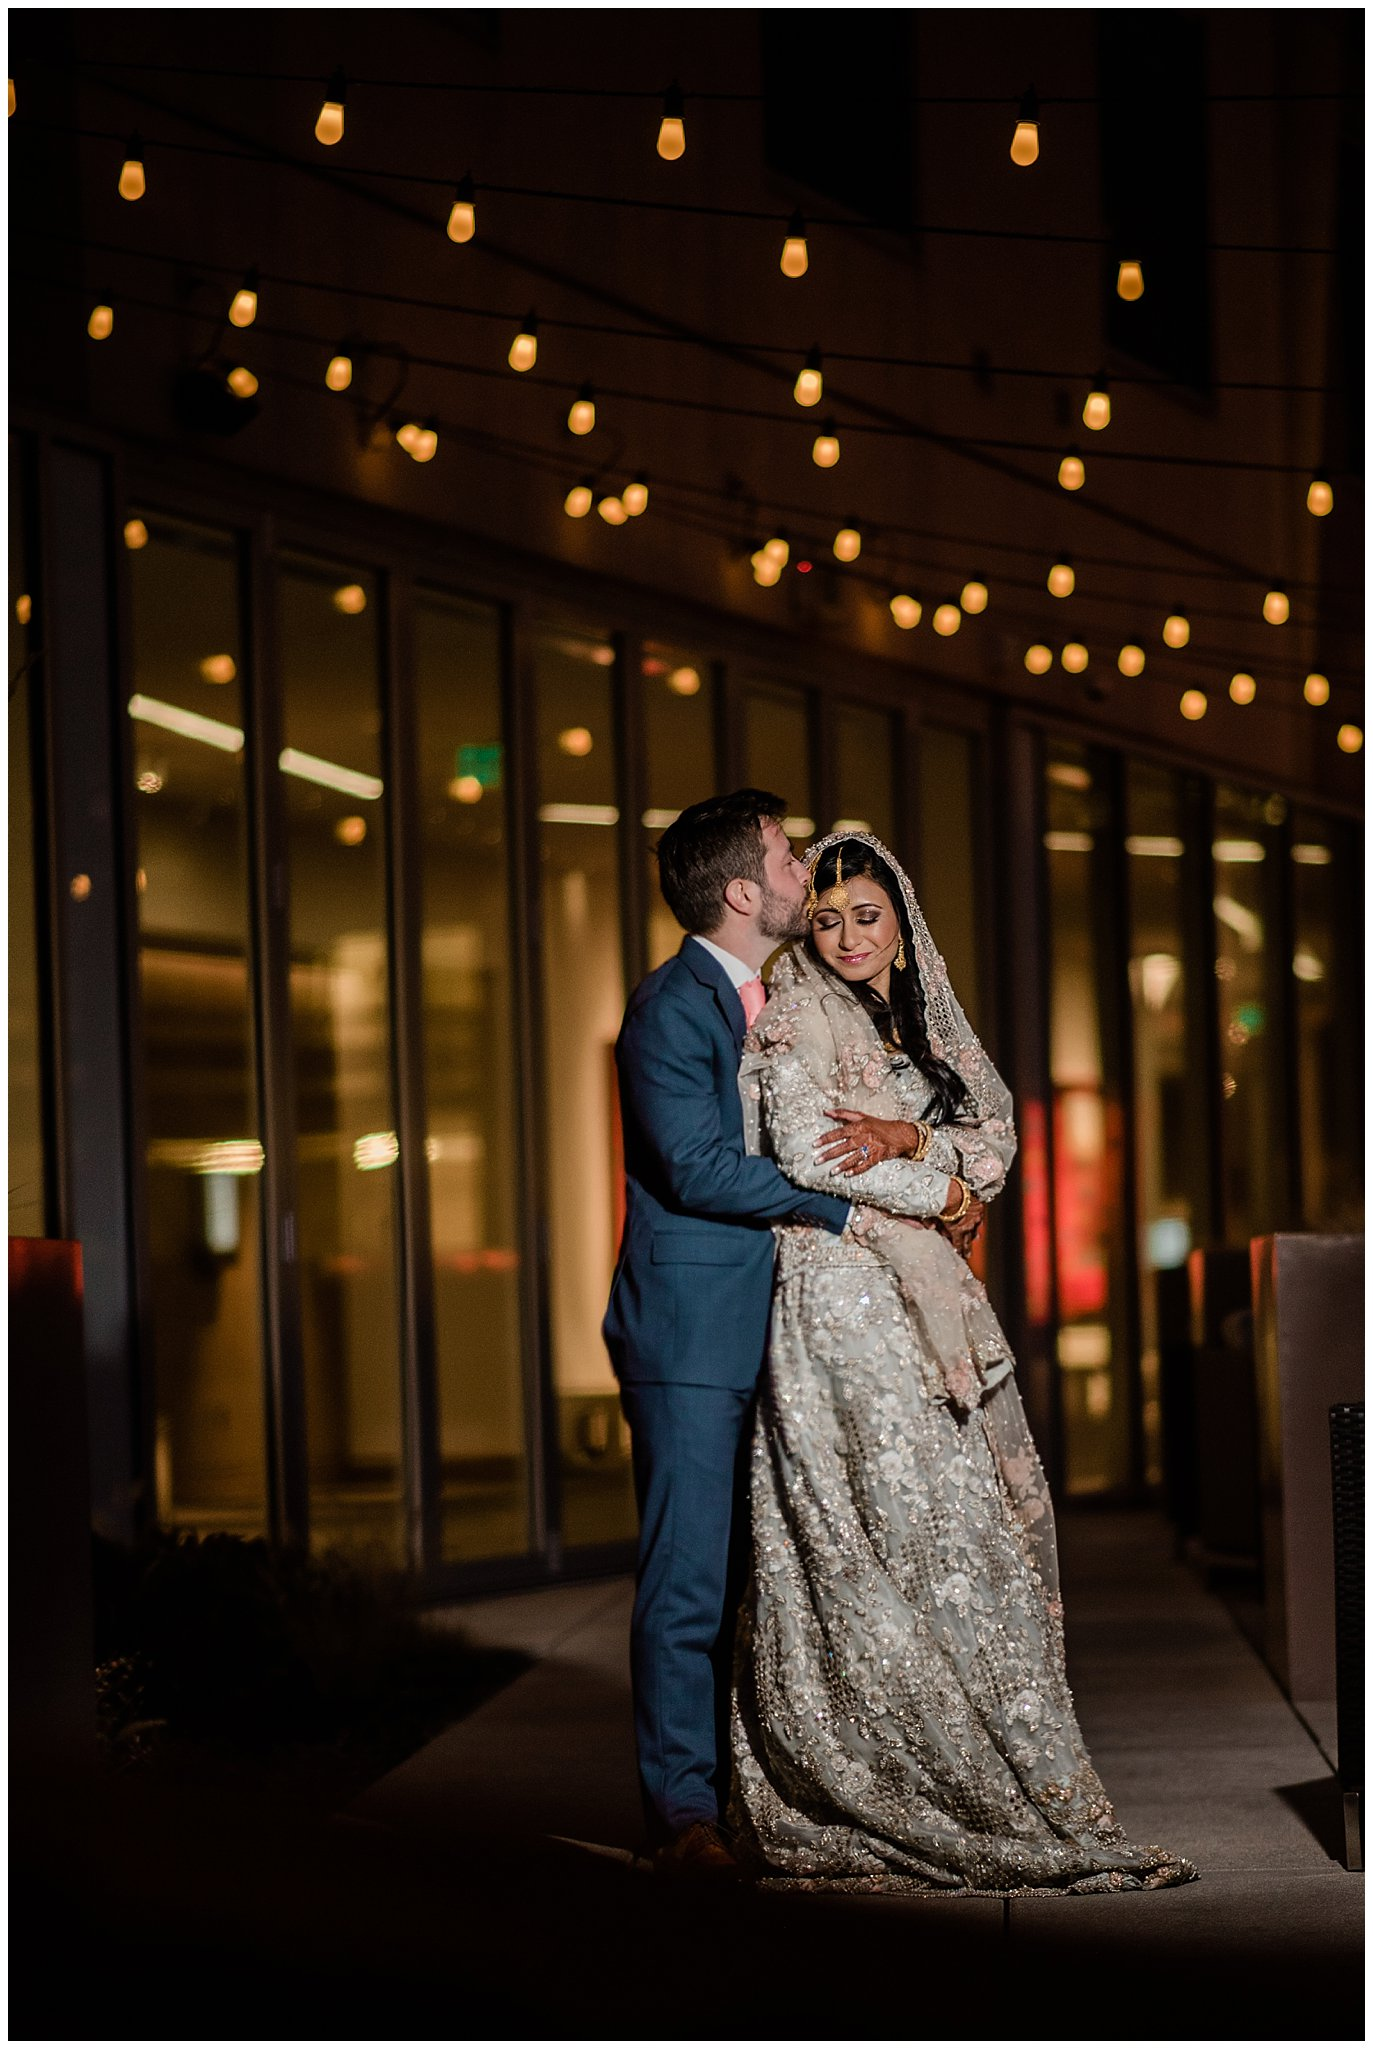 The Art Hotel Denver Nikah wedding photo